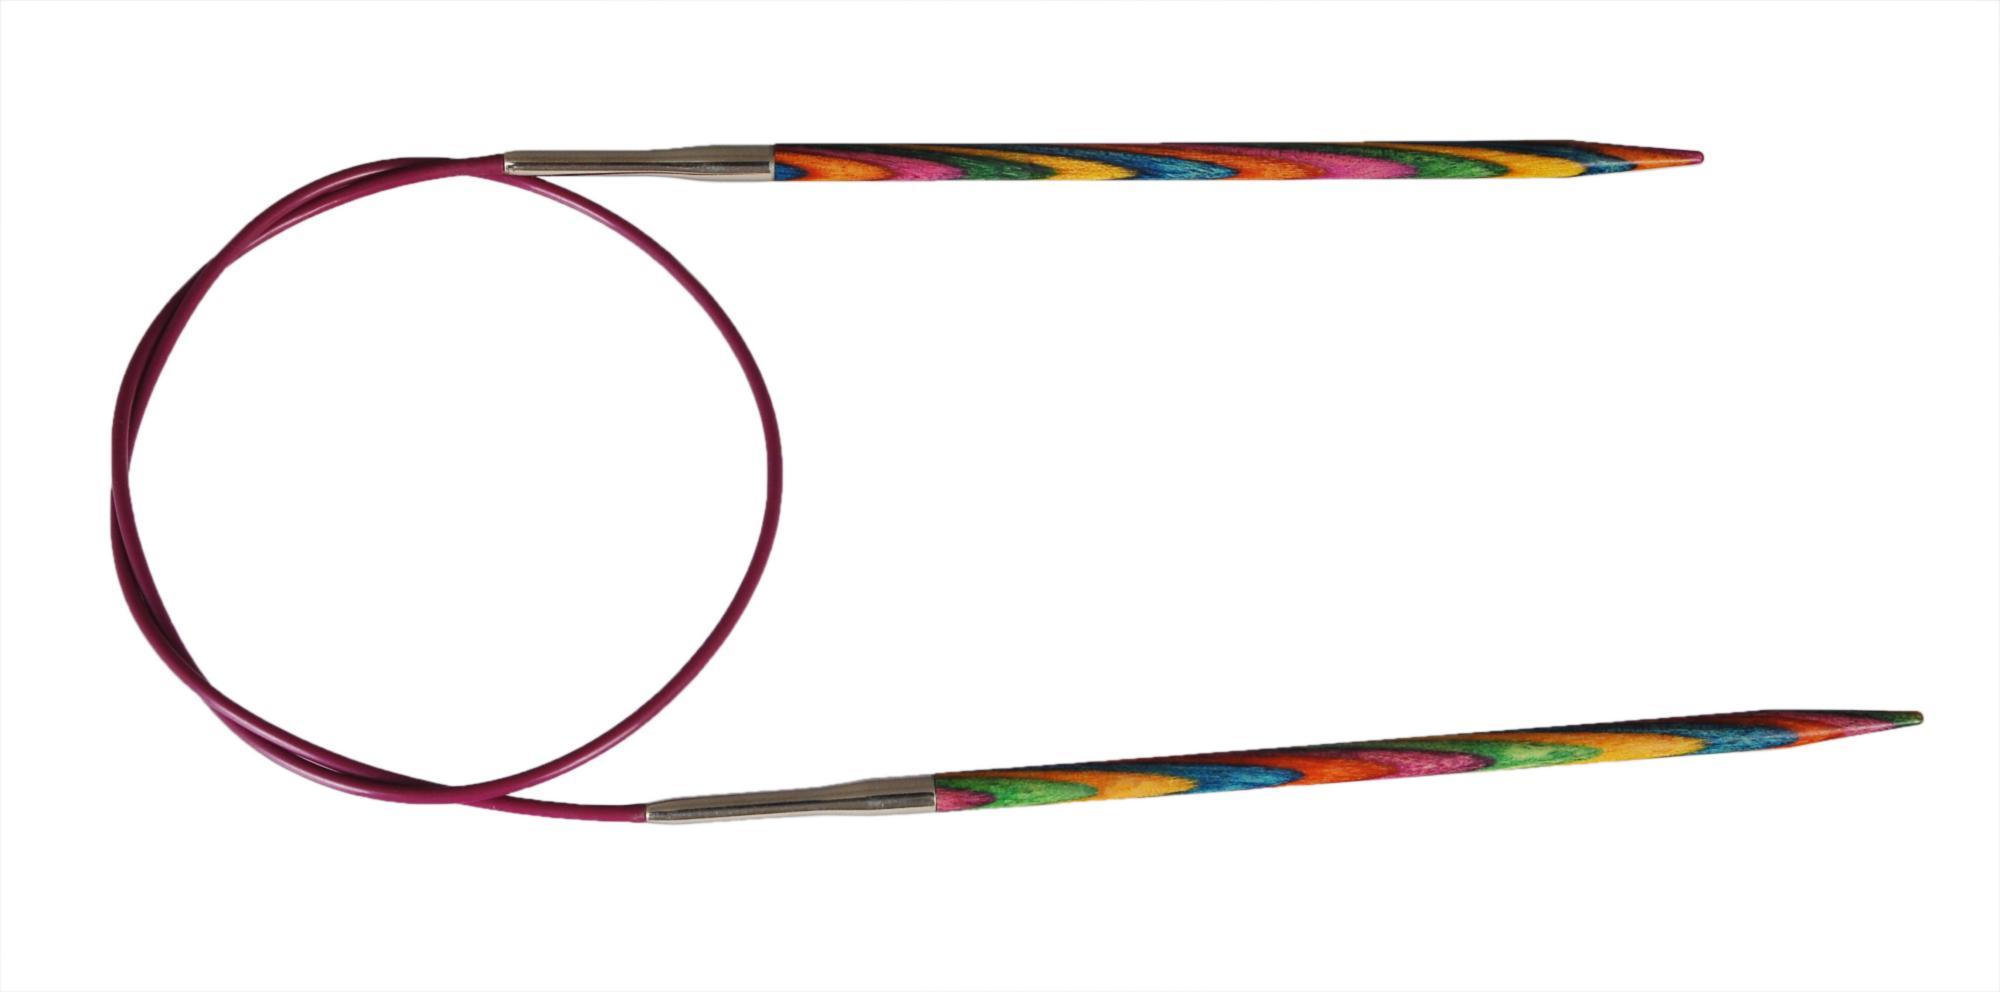 Спицы круговые 80 см Symfonie Wood KnitPro, 21342, 6.50 мм